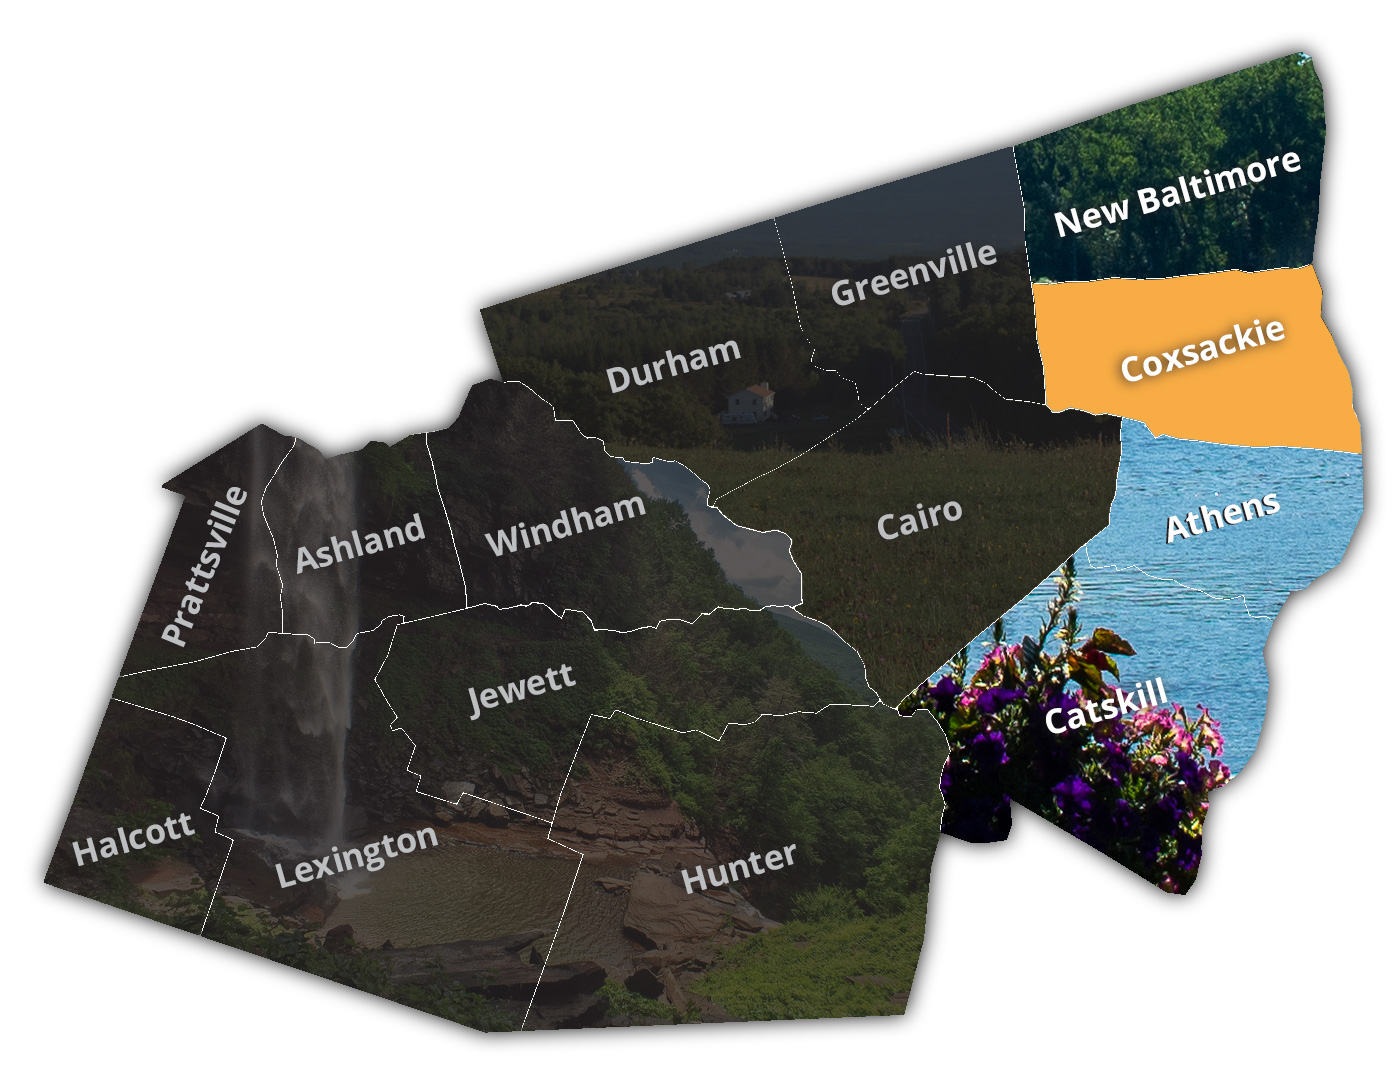 Coxsackie in Greene County